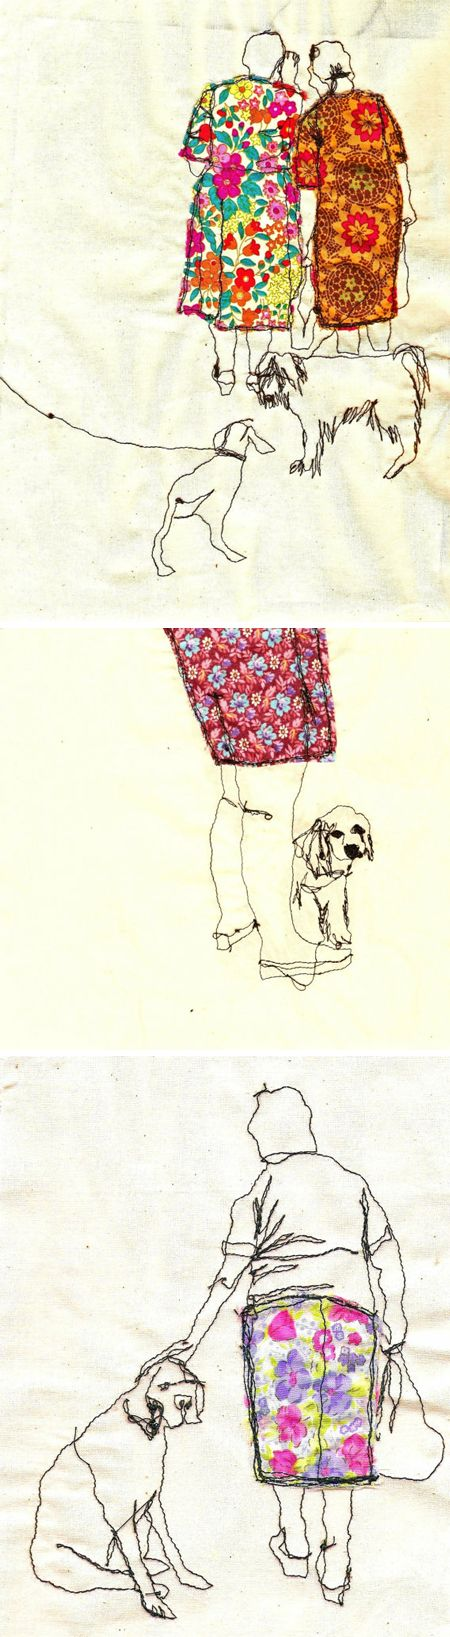 sarah walton embroidery